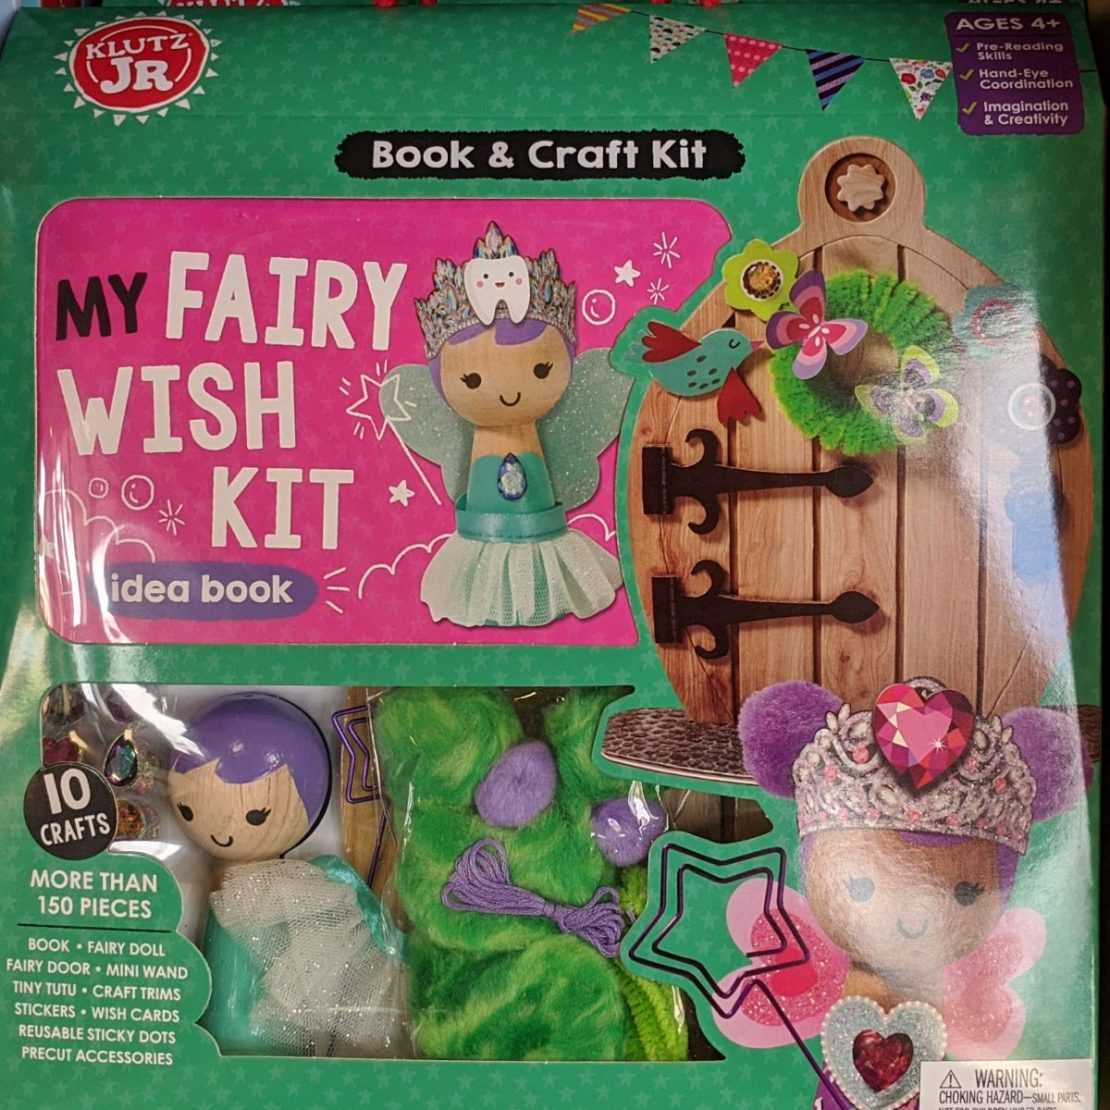 My Fairy Wish Kit from Klutz Jr